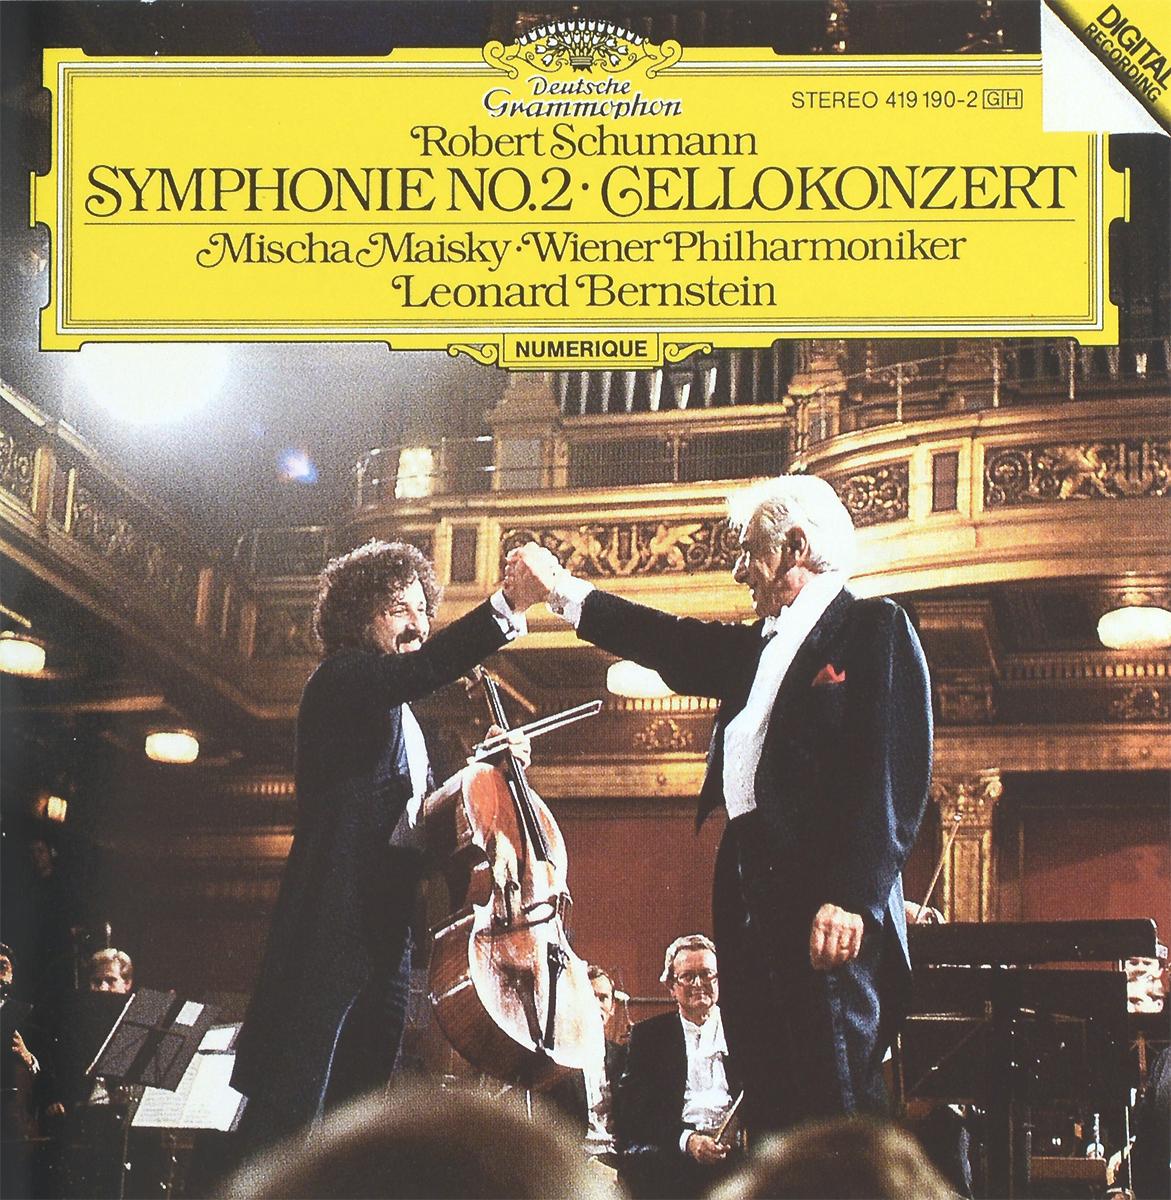 Леонард Бернштейн,Wiener Philharmoniker Leonard Bernstein. Robert Schumann. Symphonie No. 2 / Cellokonzert cd leonard bernstein wiener philharmoniker